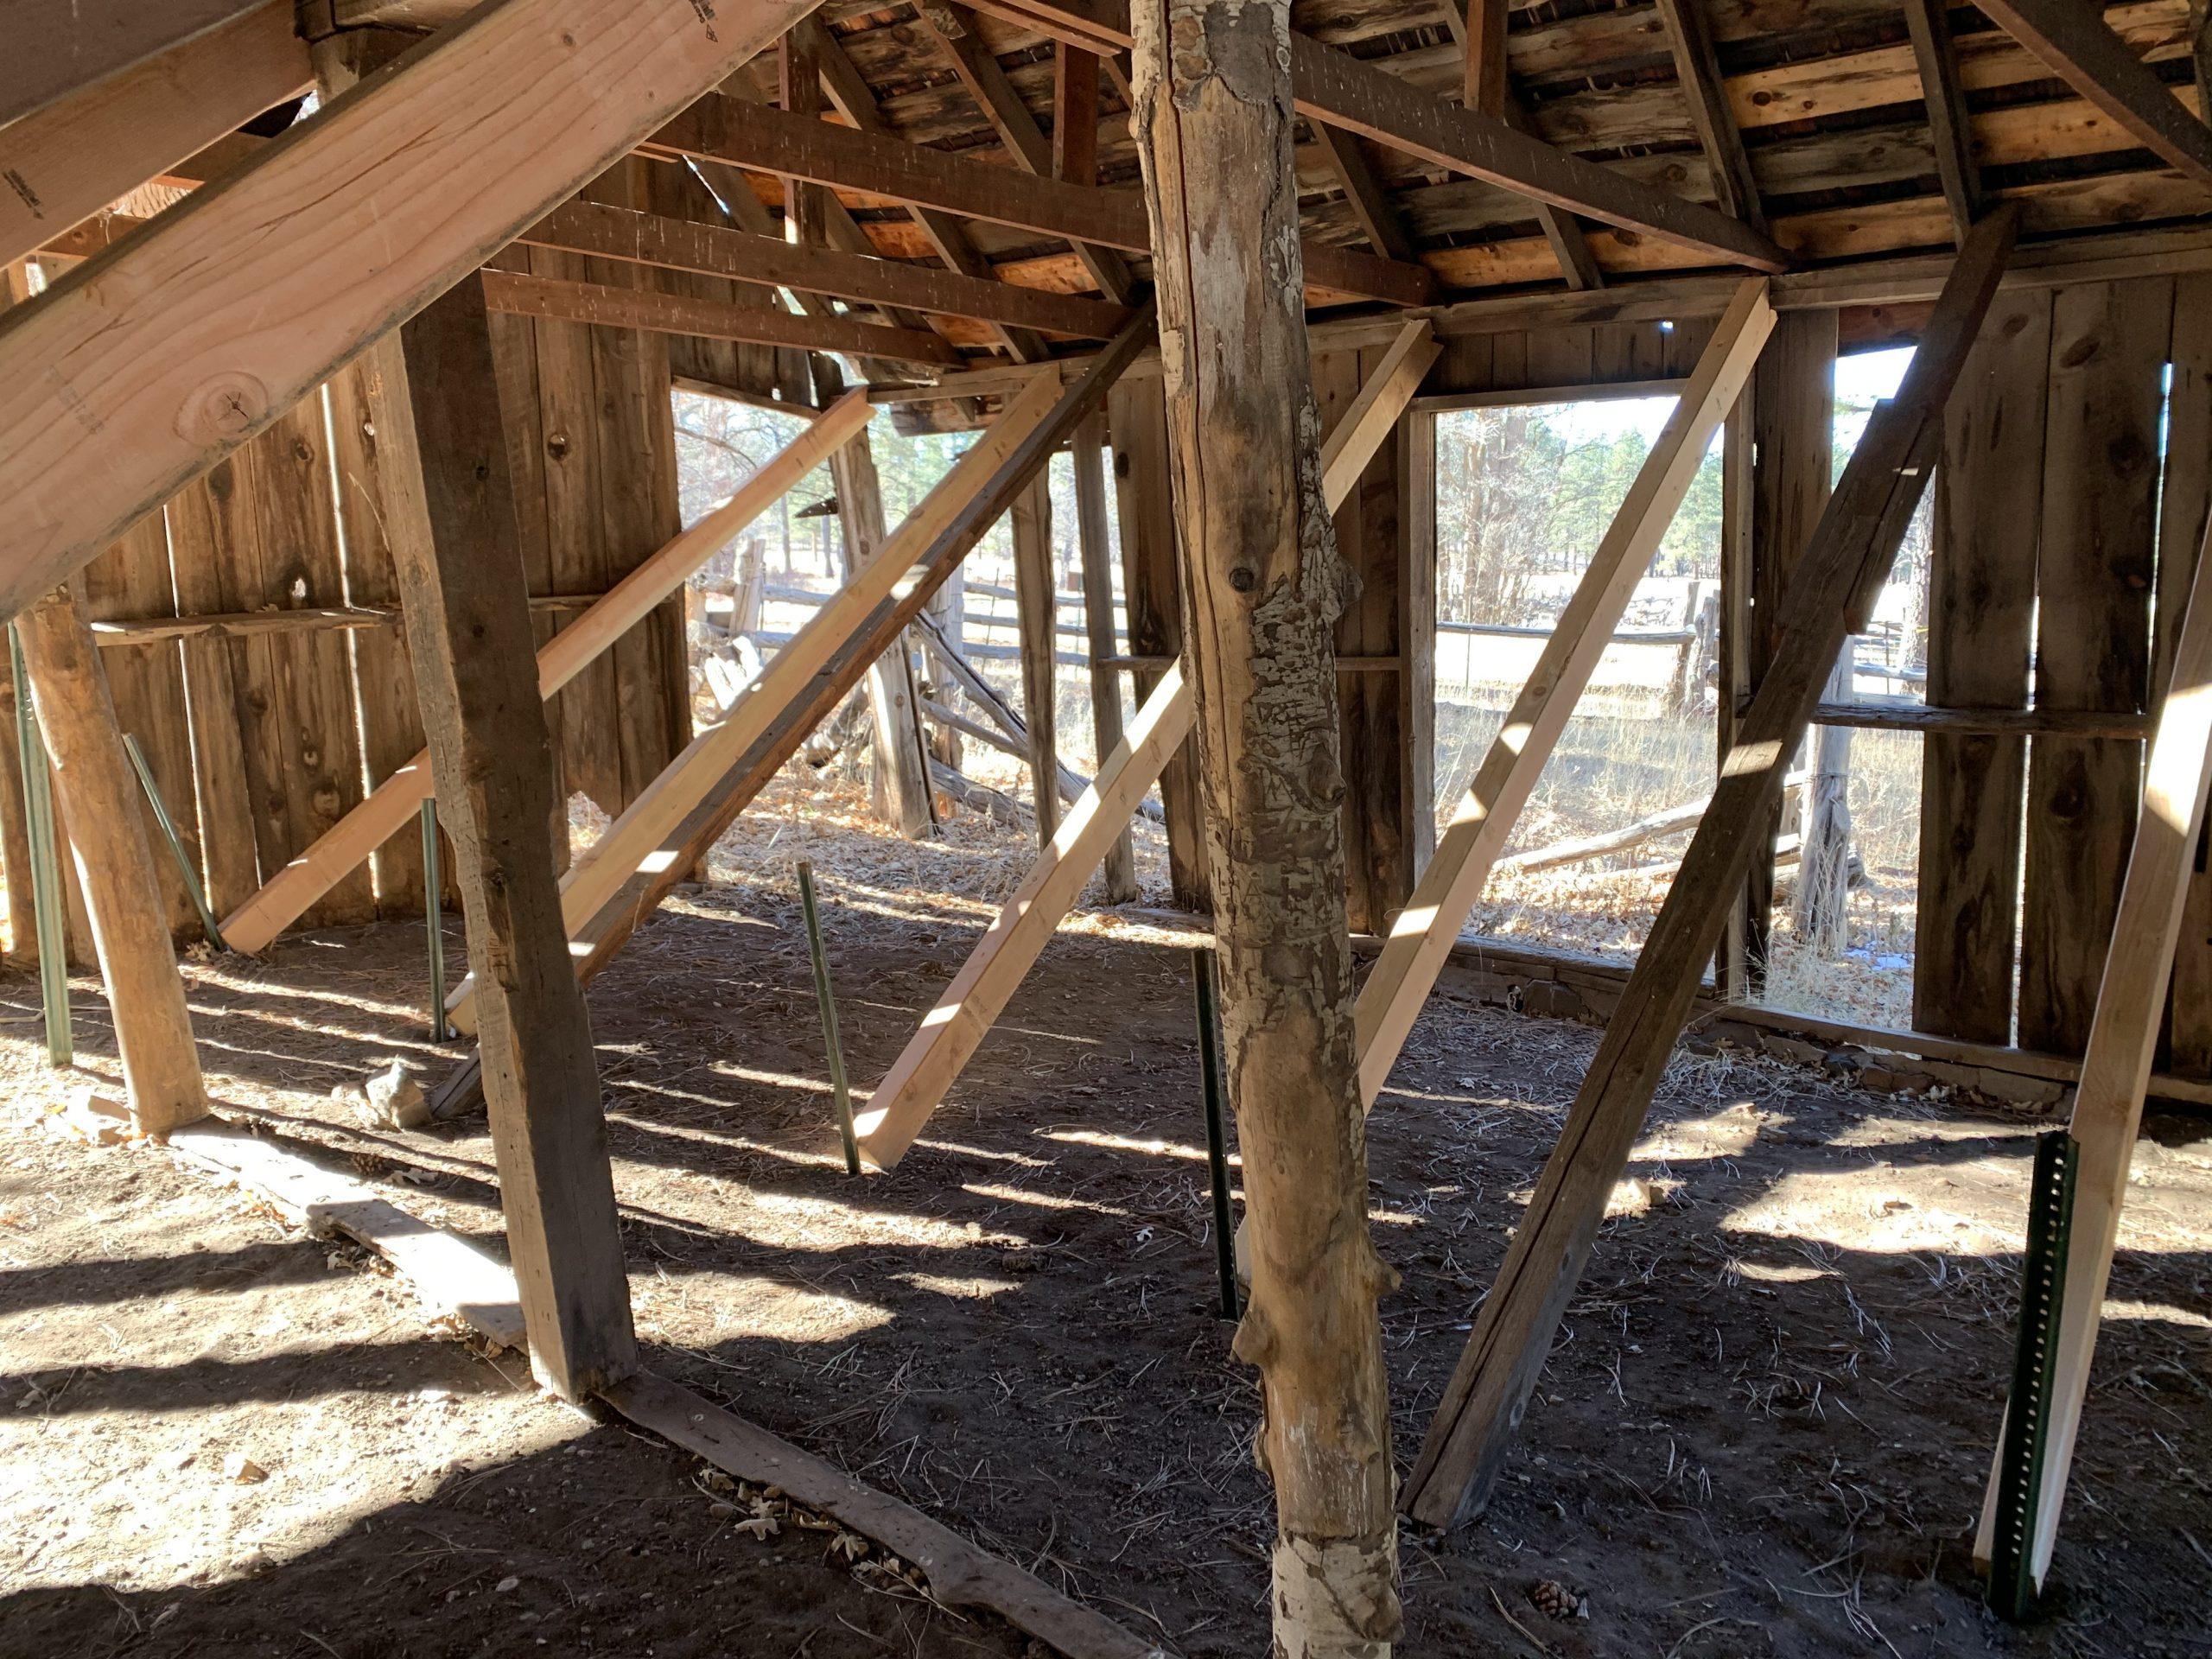 Los Burros Barn, AZ 2021